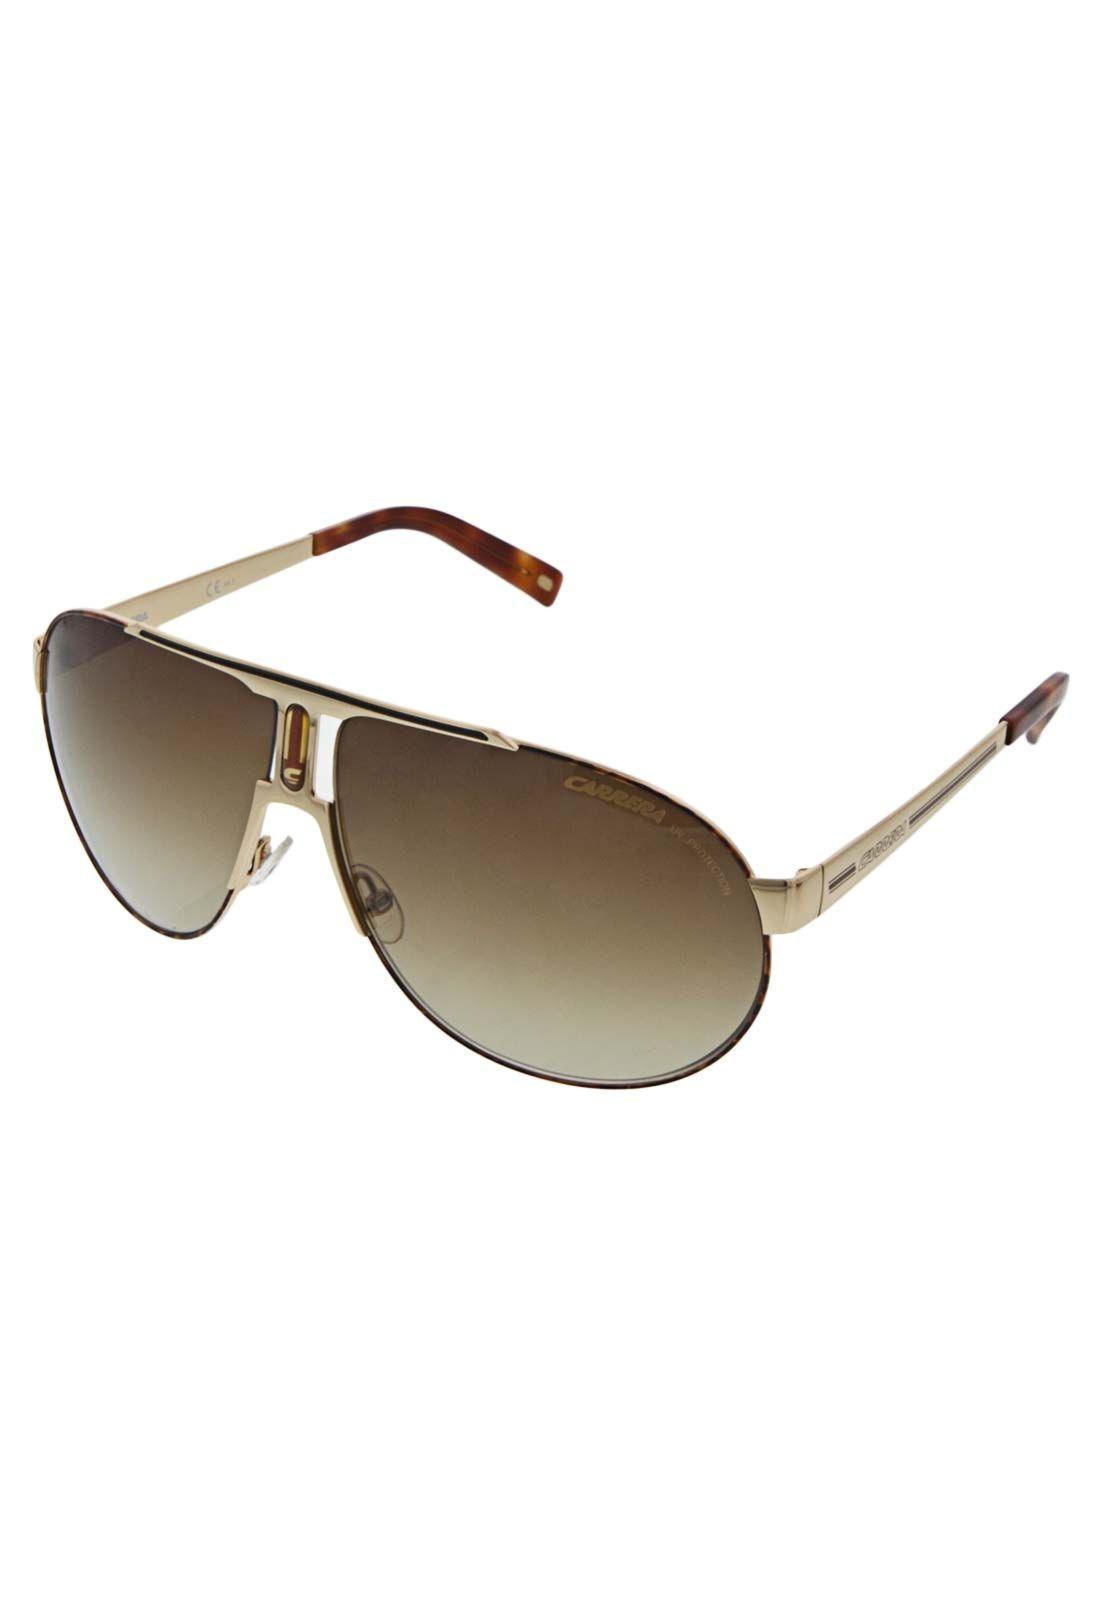 012857025d242 Óculos Solares Carrera Panamerika Dourado - Compre Agora   Dafiti Brasil